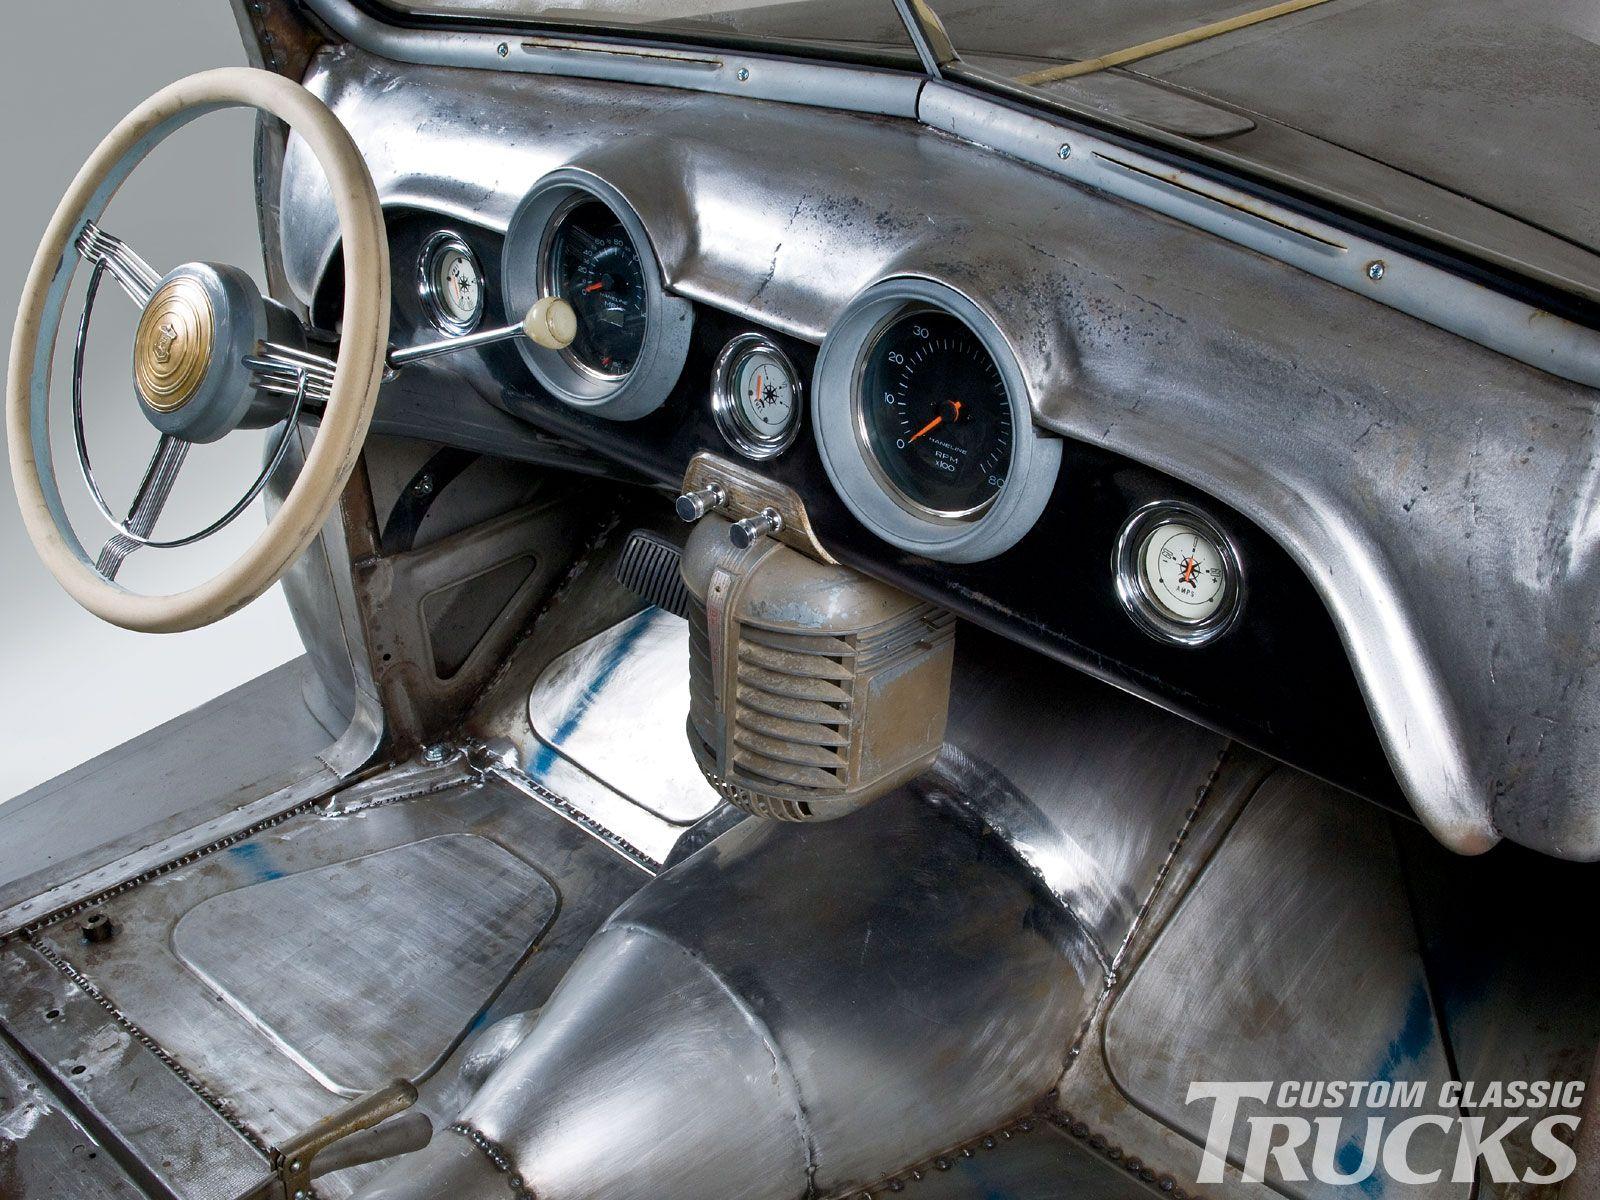 Super Cool Bare Metal Interior With Vintage Drive In Theater Speaker Hanging Under The Dash Rat Rod Rat Rod Interior Custom Car Interior